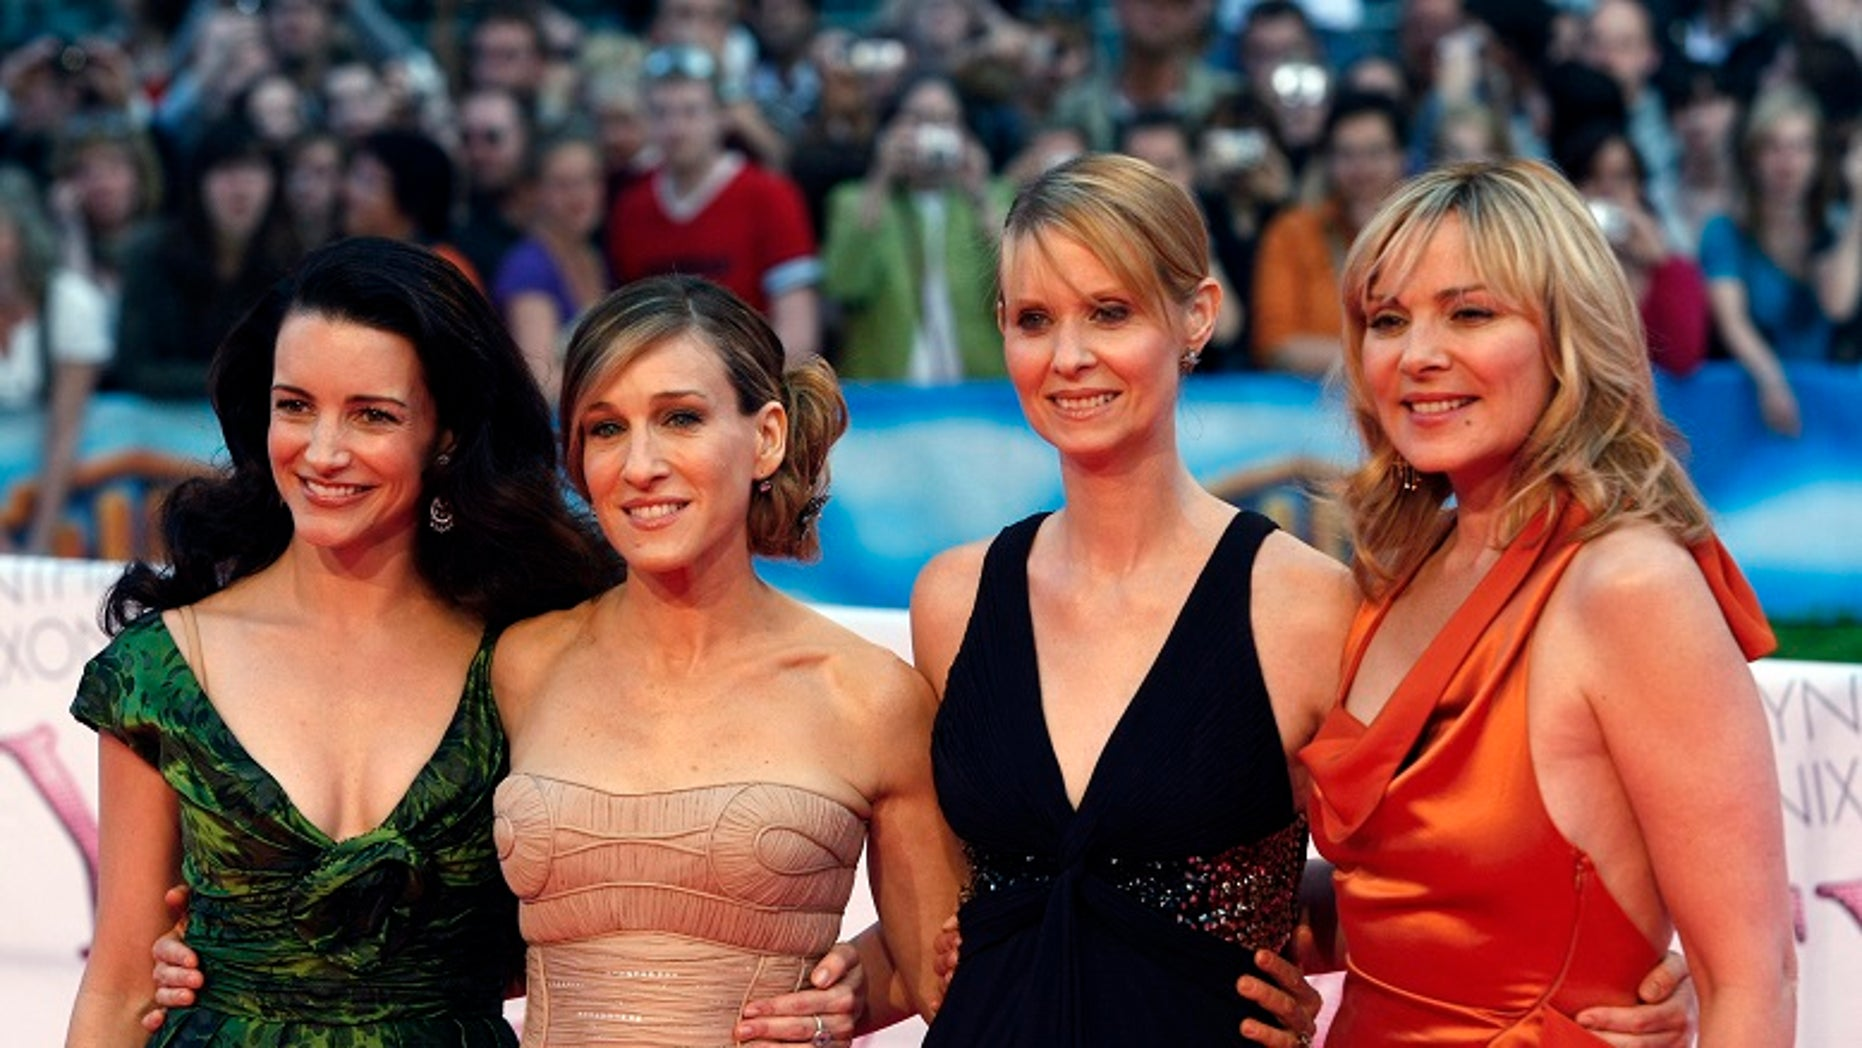 """Sex and the City"" co-stars from l-r: Kristin Davis, Sarah Jessica Parker, Cynthia Nixon and Kim Cattrall."